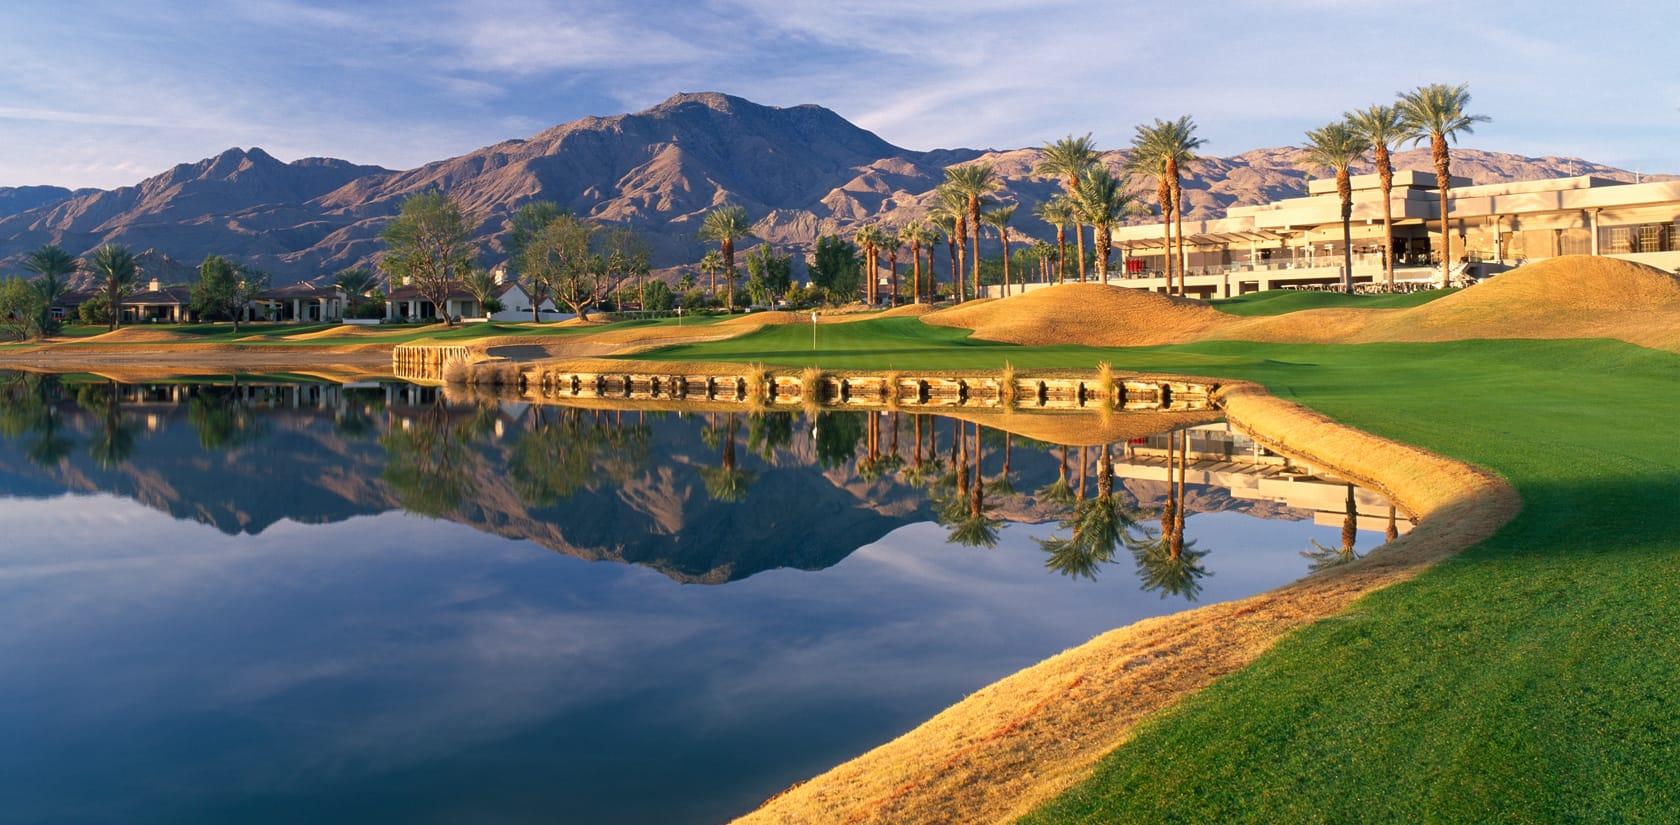 la quinta resort palm springs unlimited golf special 4th. Black Bedroom Furniture Sets. Home Design Ideas